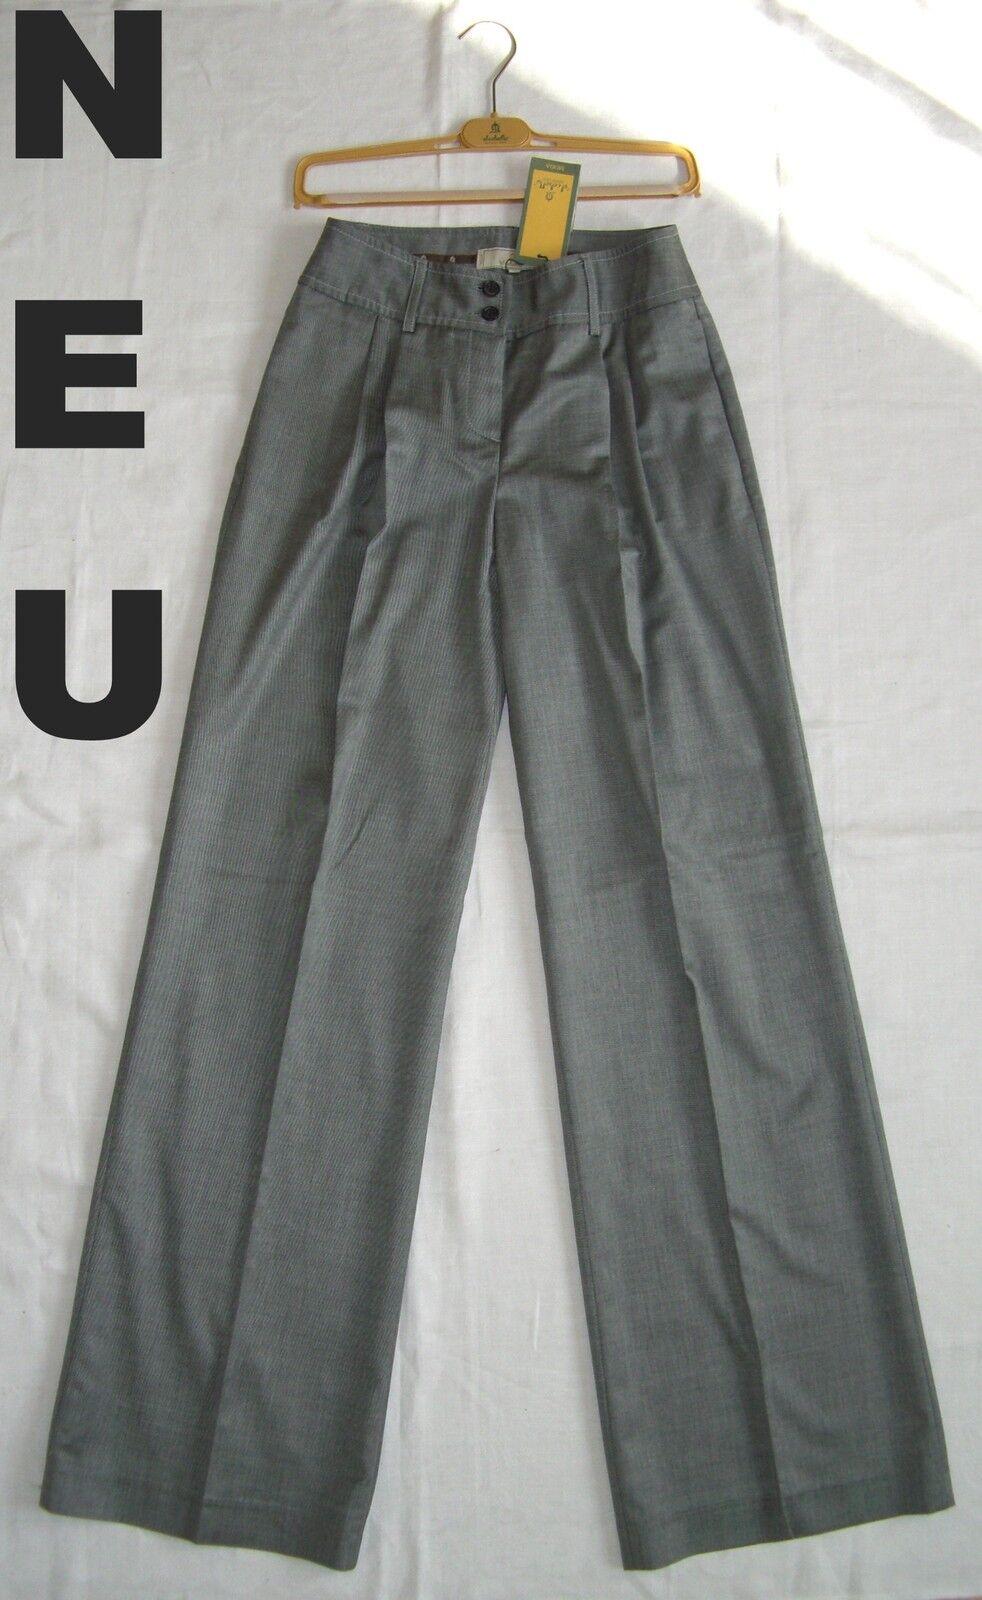 El Cabollo lyx Trousers 38 = XS  S 34  36 elegant GRE bussINS Fabric Suit Pants ny